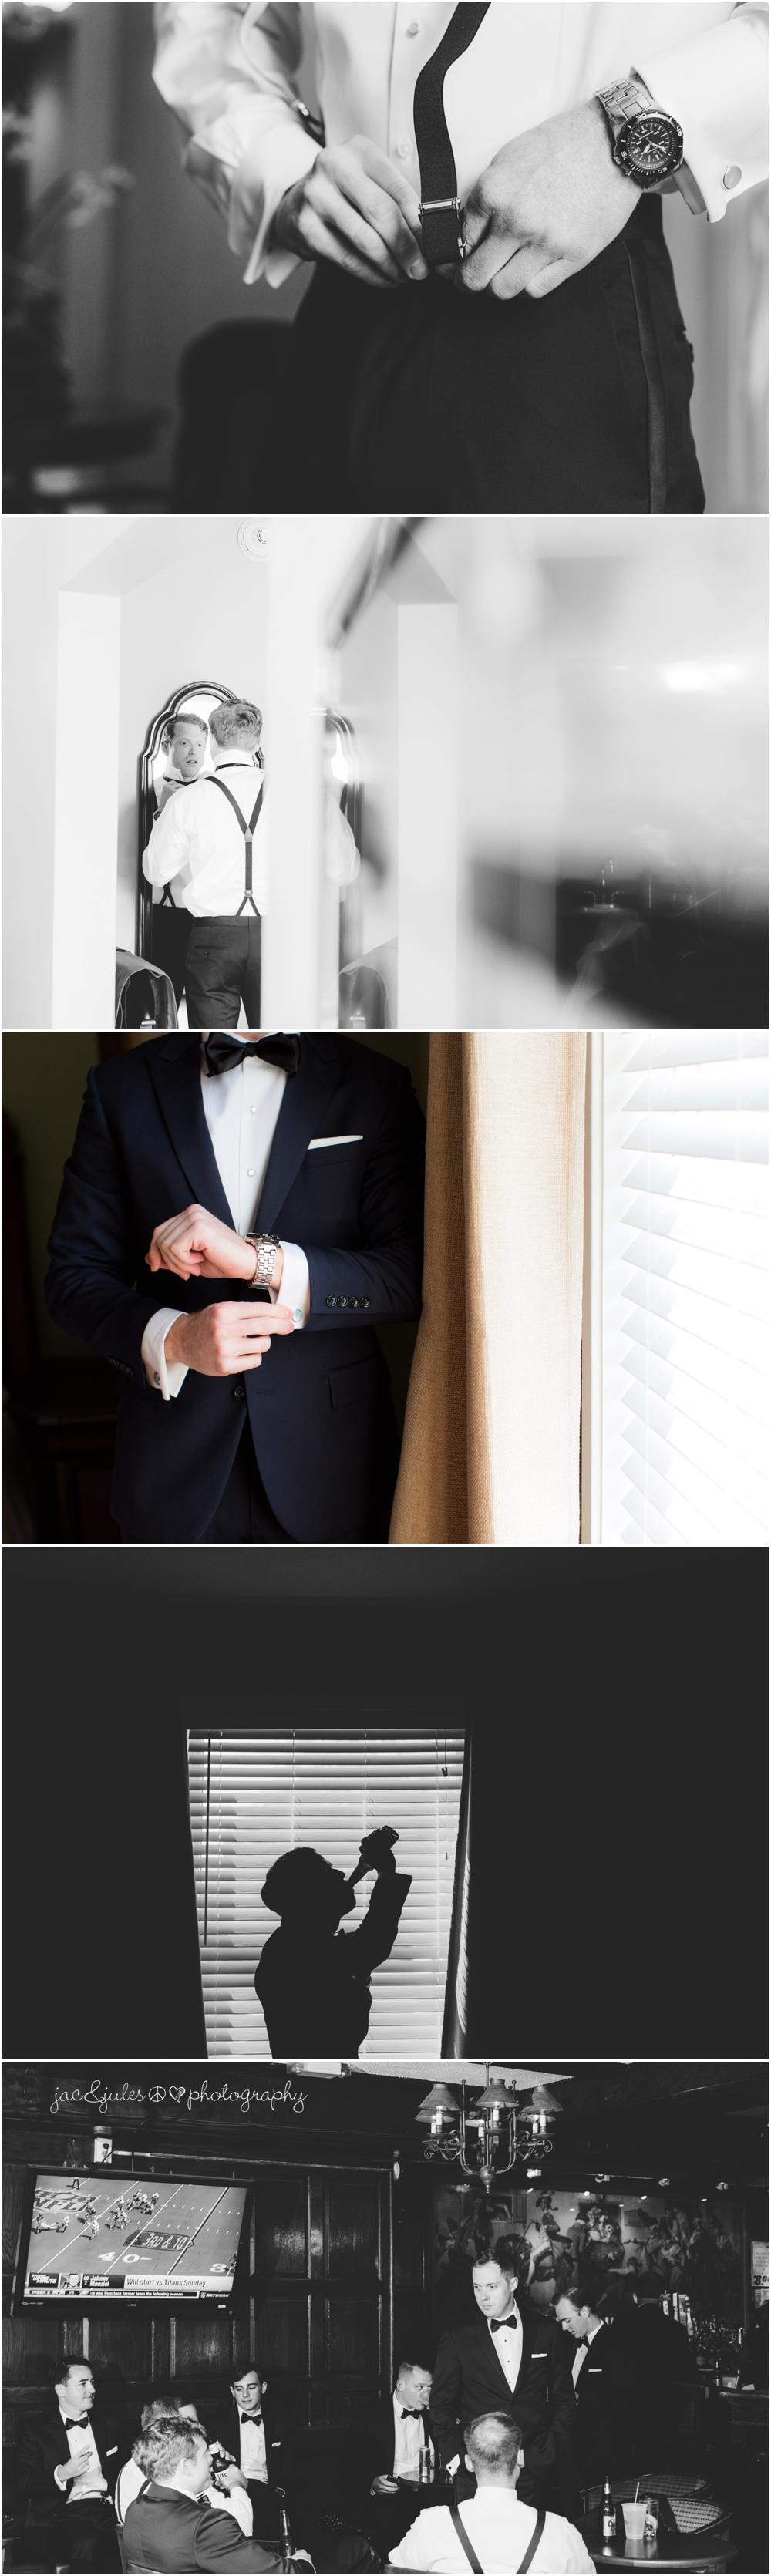 jacnjules photographs groom getting ready at nassau inn in princeton nj